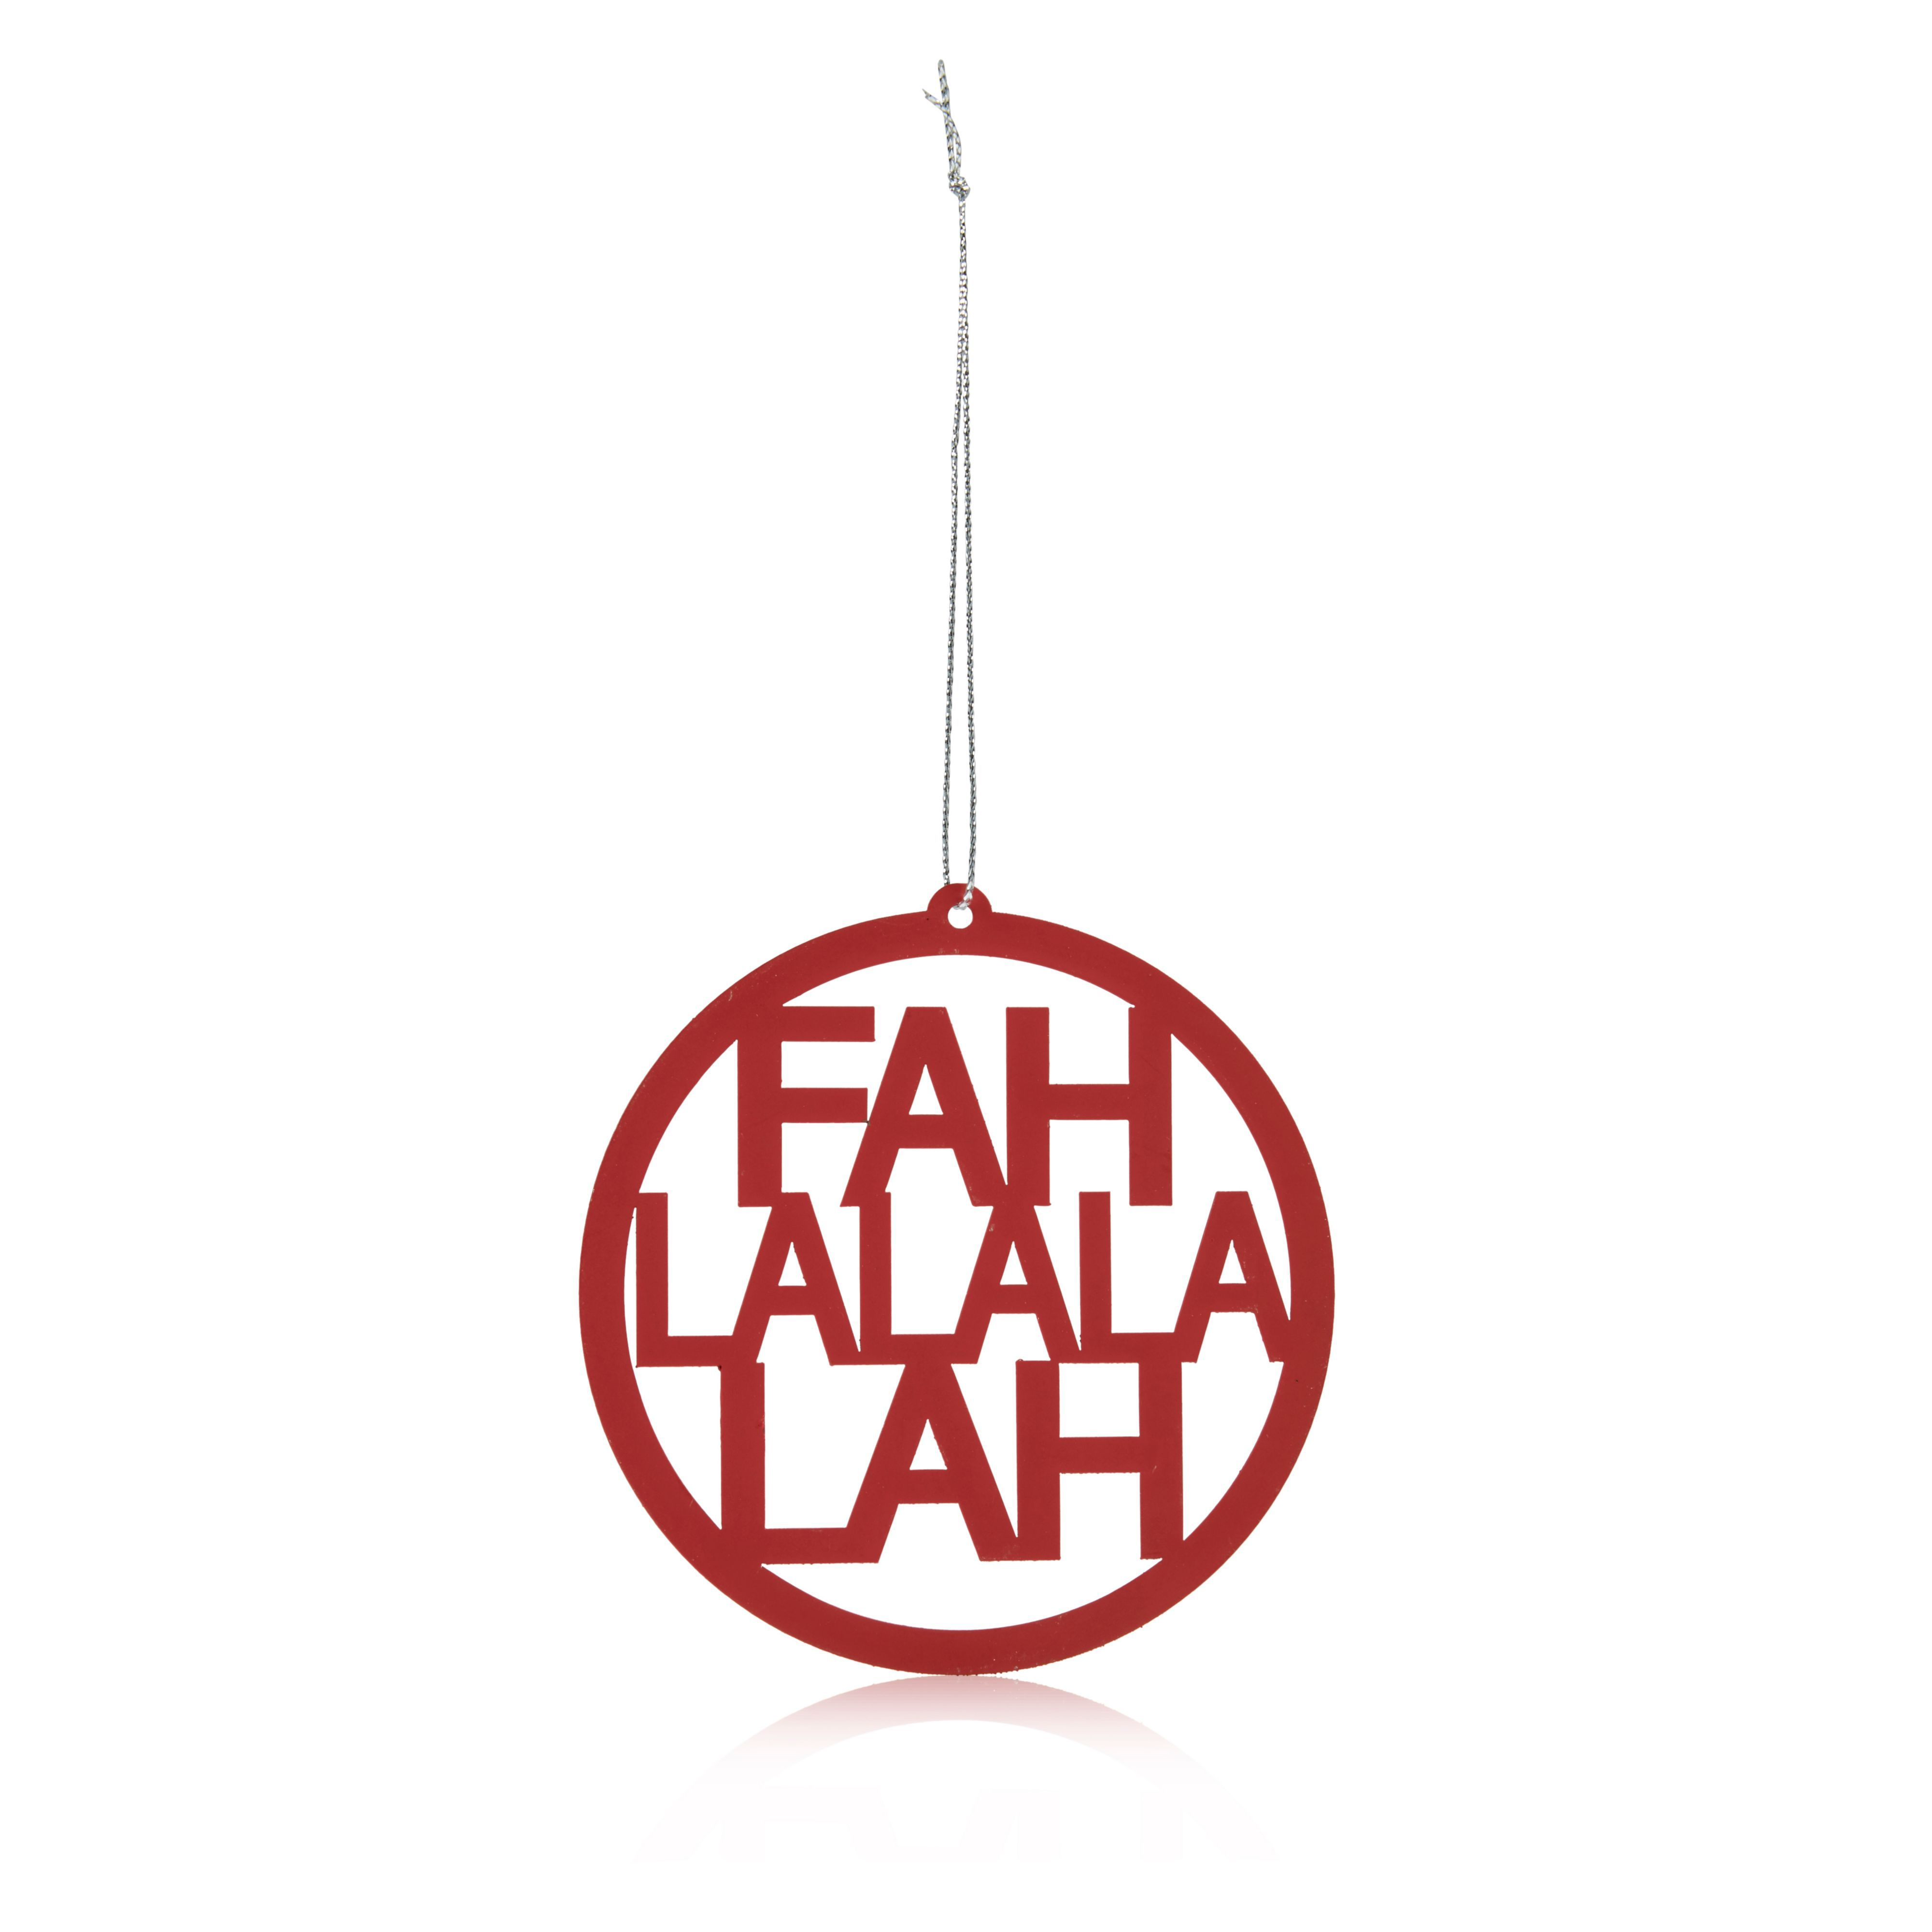 Metal Red Fah La La La Lah Tree Decoration